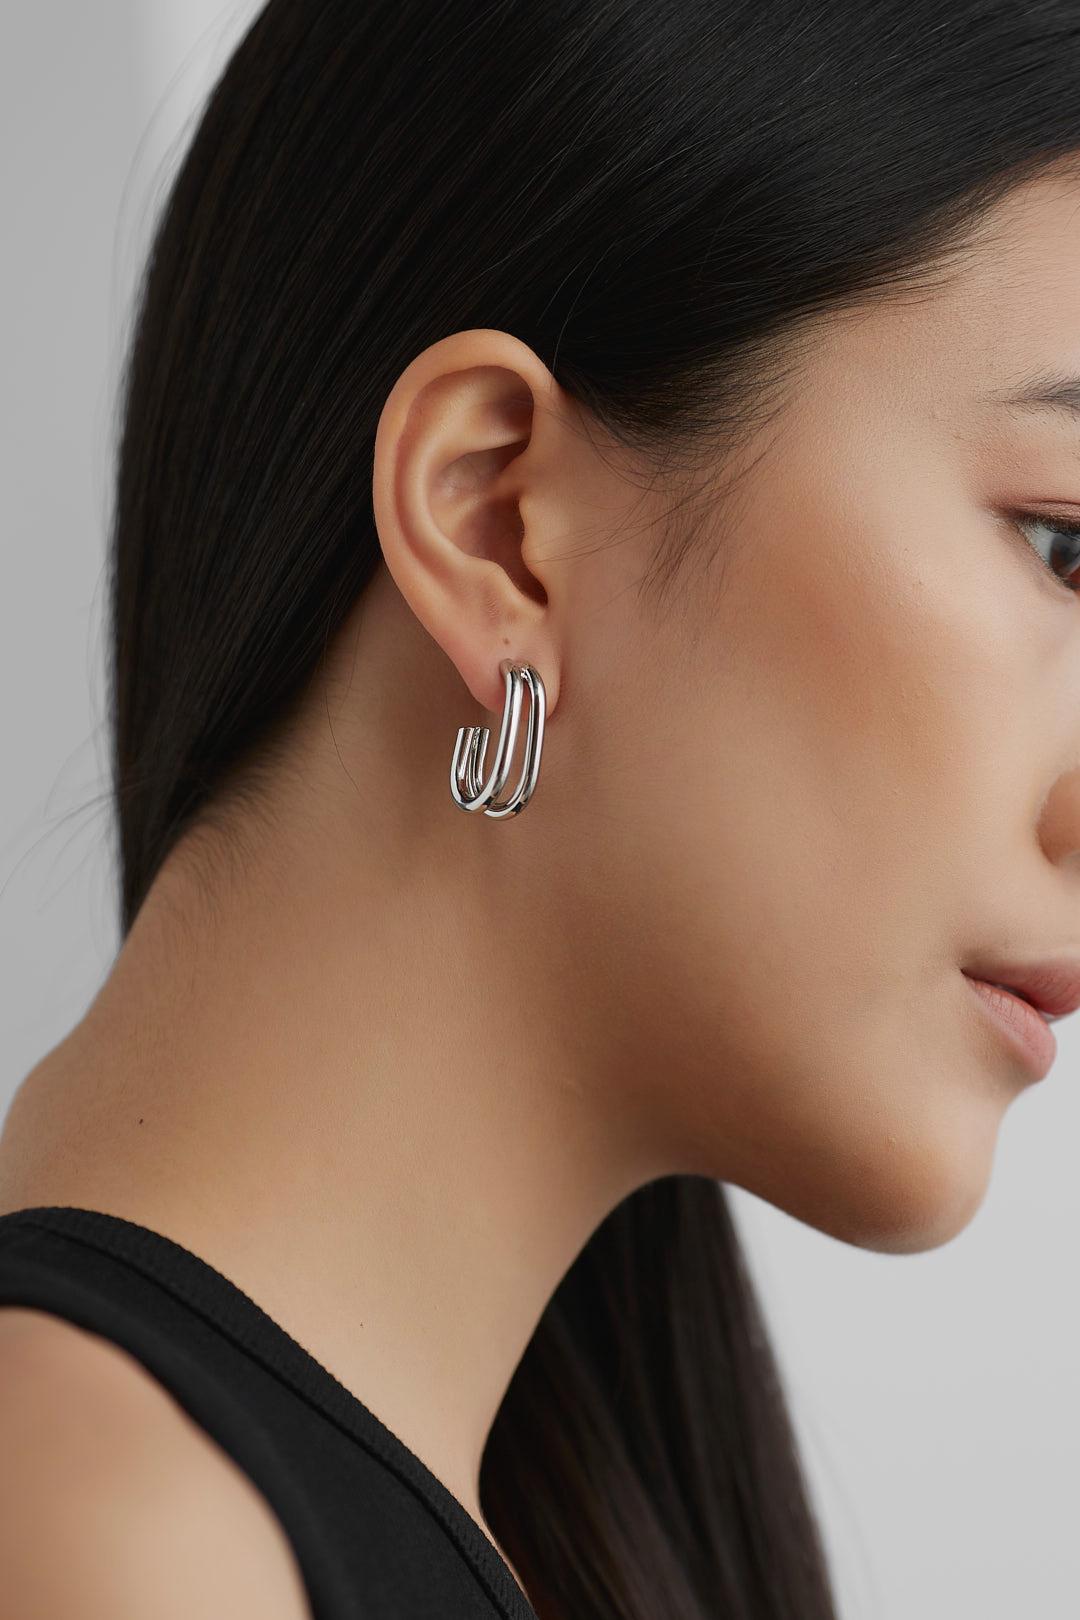 Adora Earrings